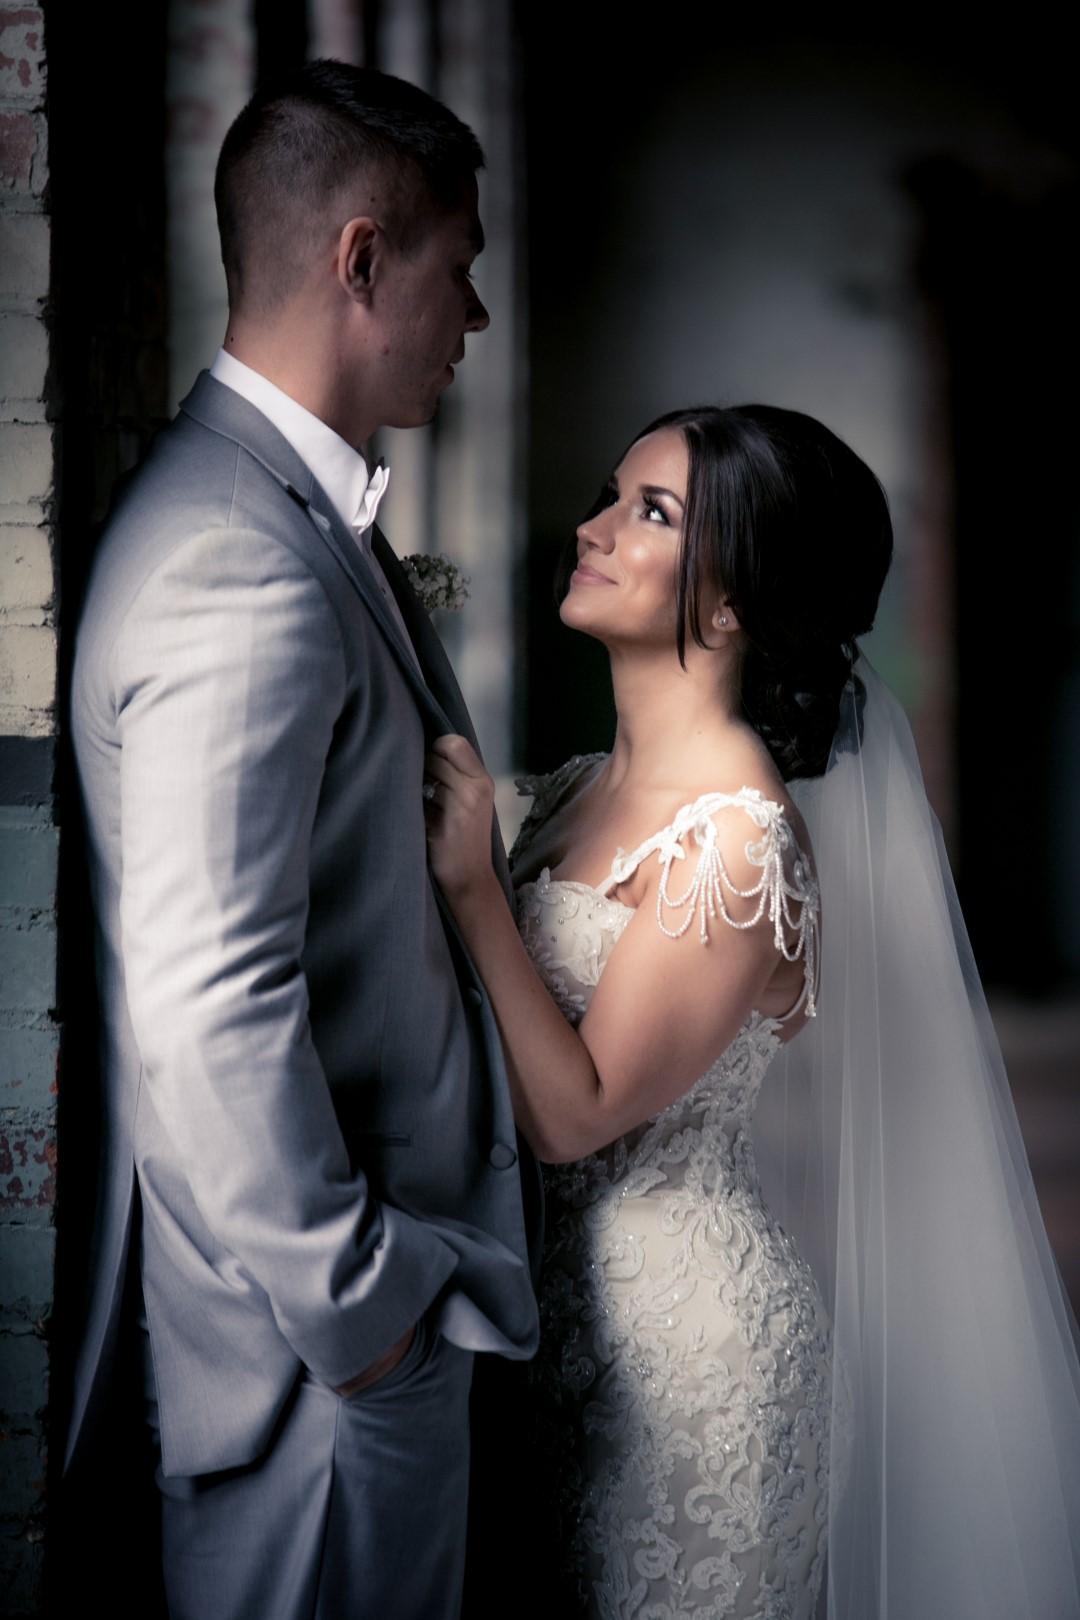 dangelo-wedding_36